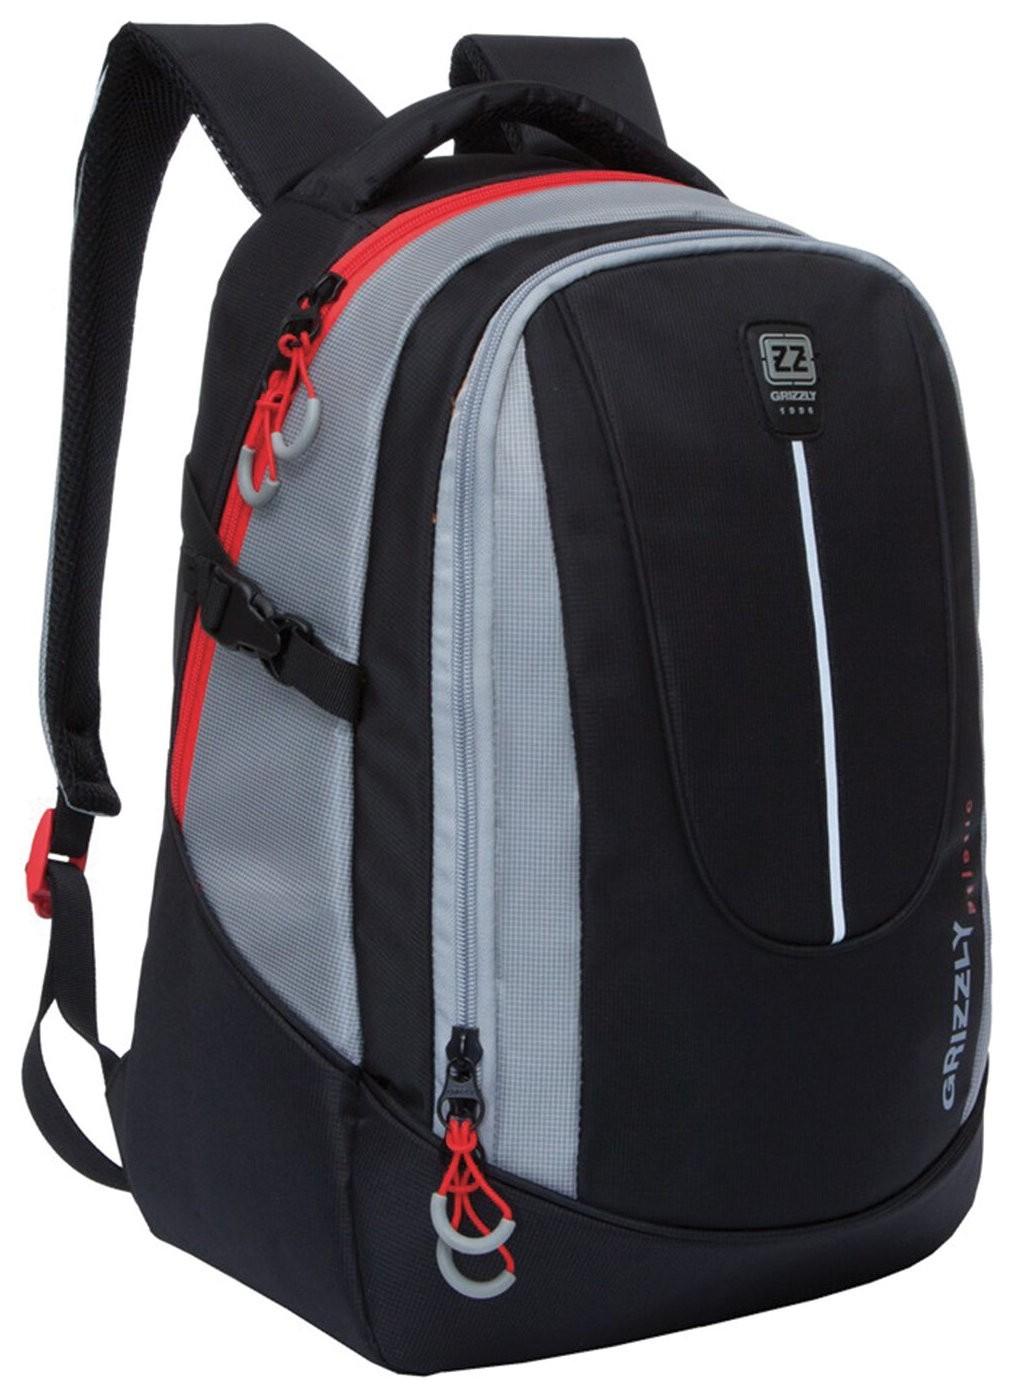 Рюкзак молодежный 44x30x20 см  Grizzly